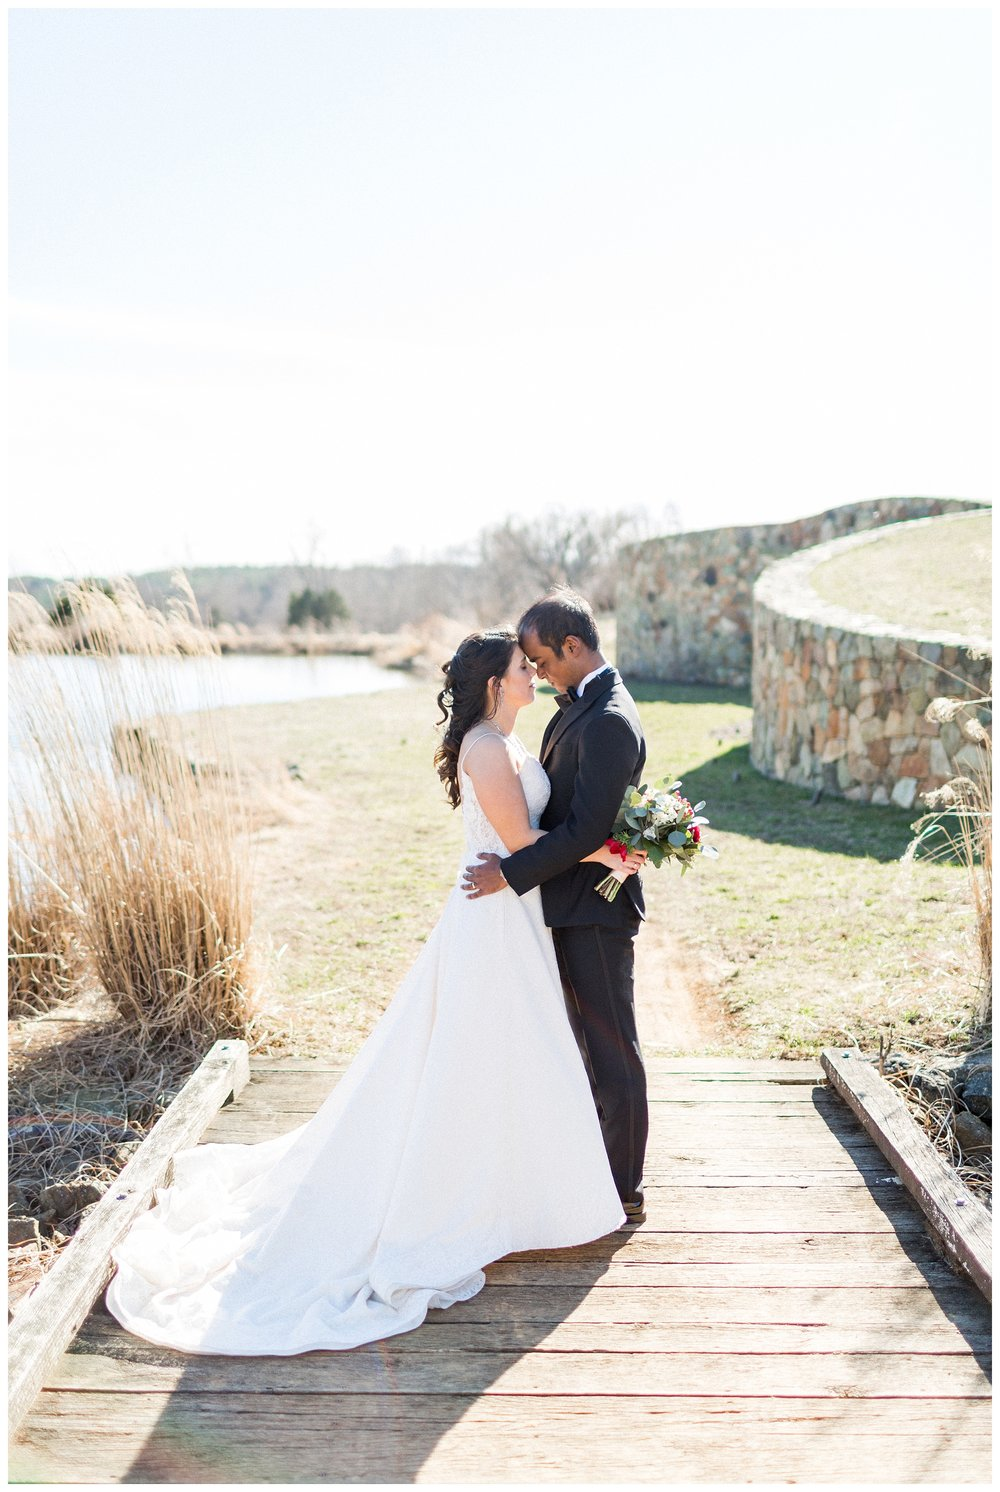 Stone Tower Winery Wedding | Virginia Winter Wedding | VA Wedding Photographer Kir Tuben_0062.jpg